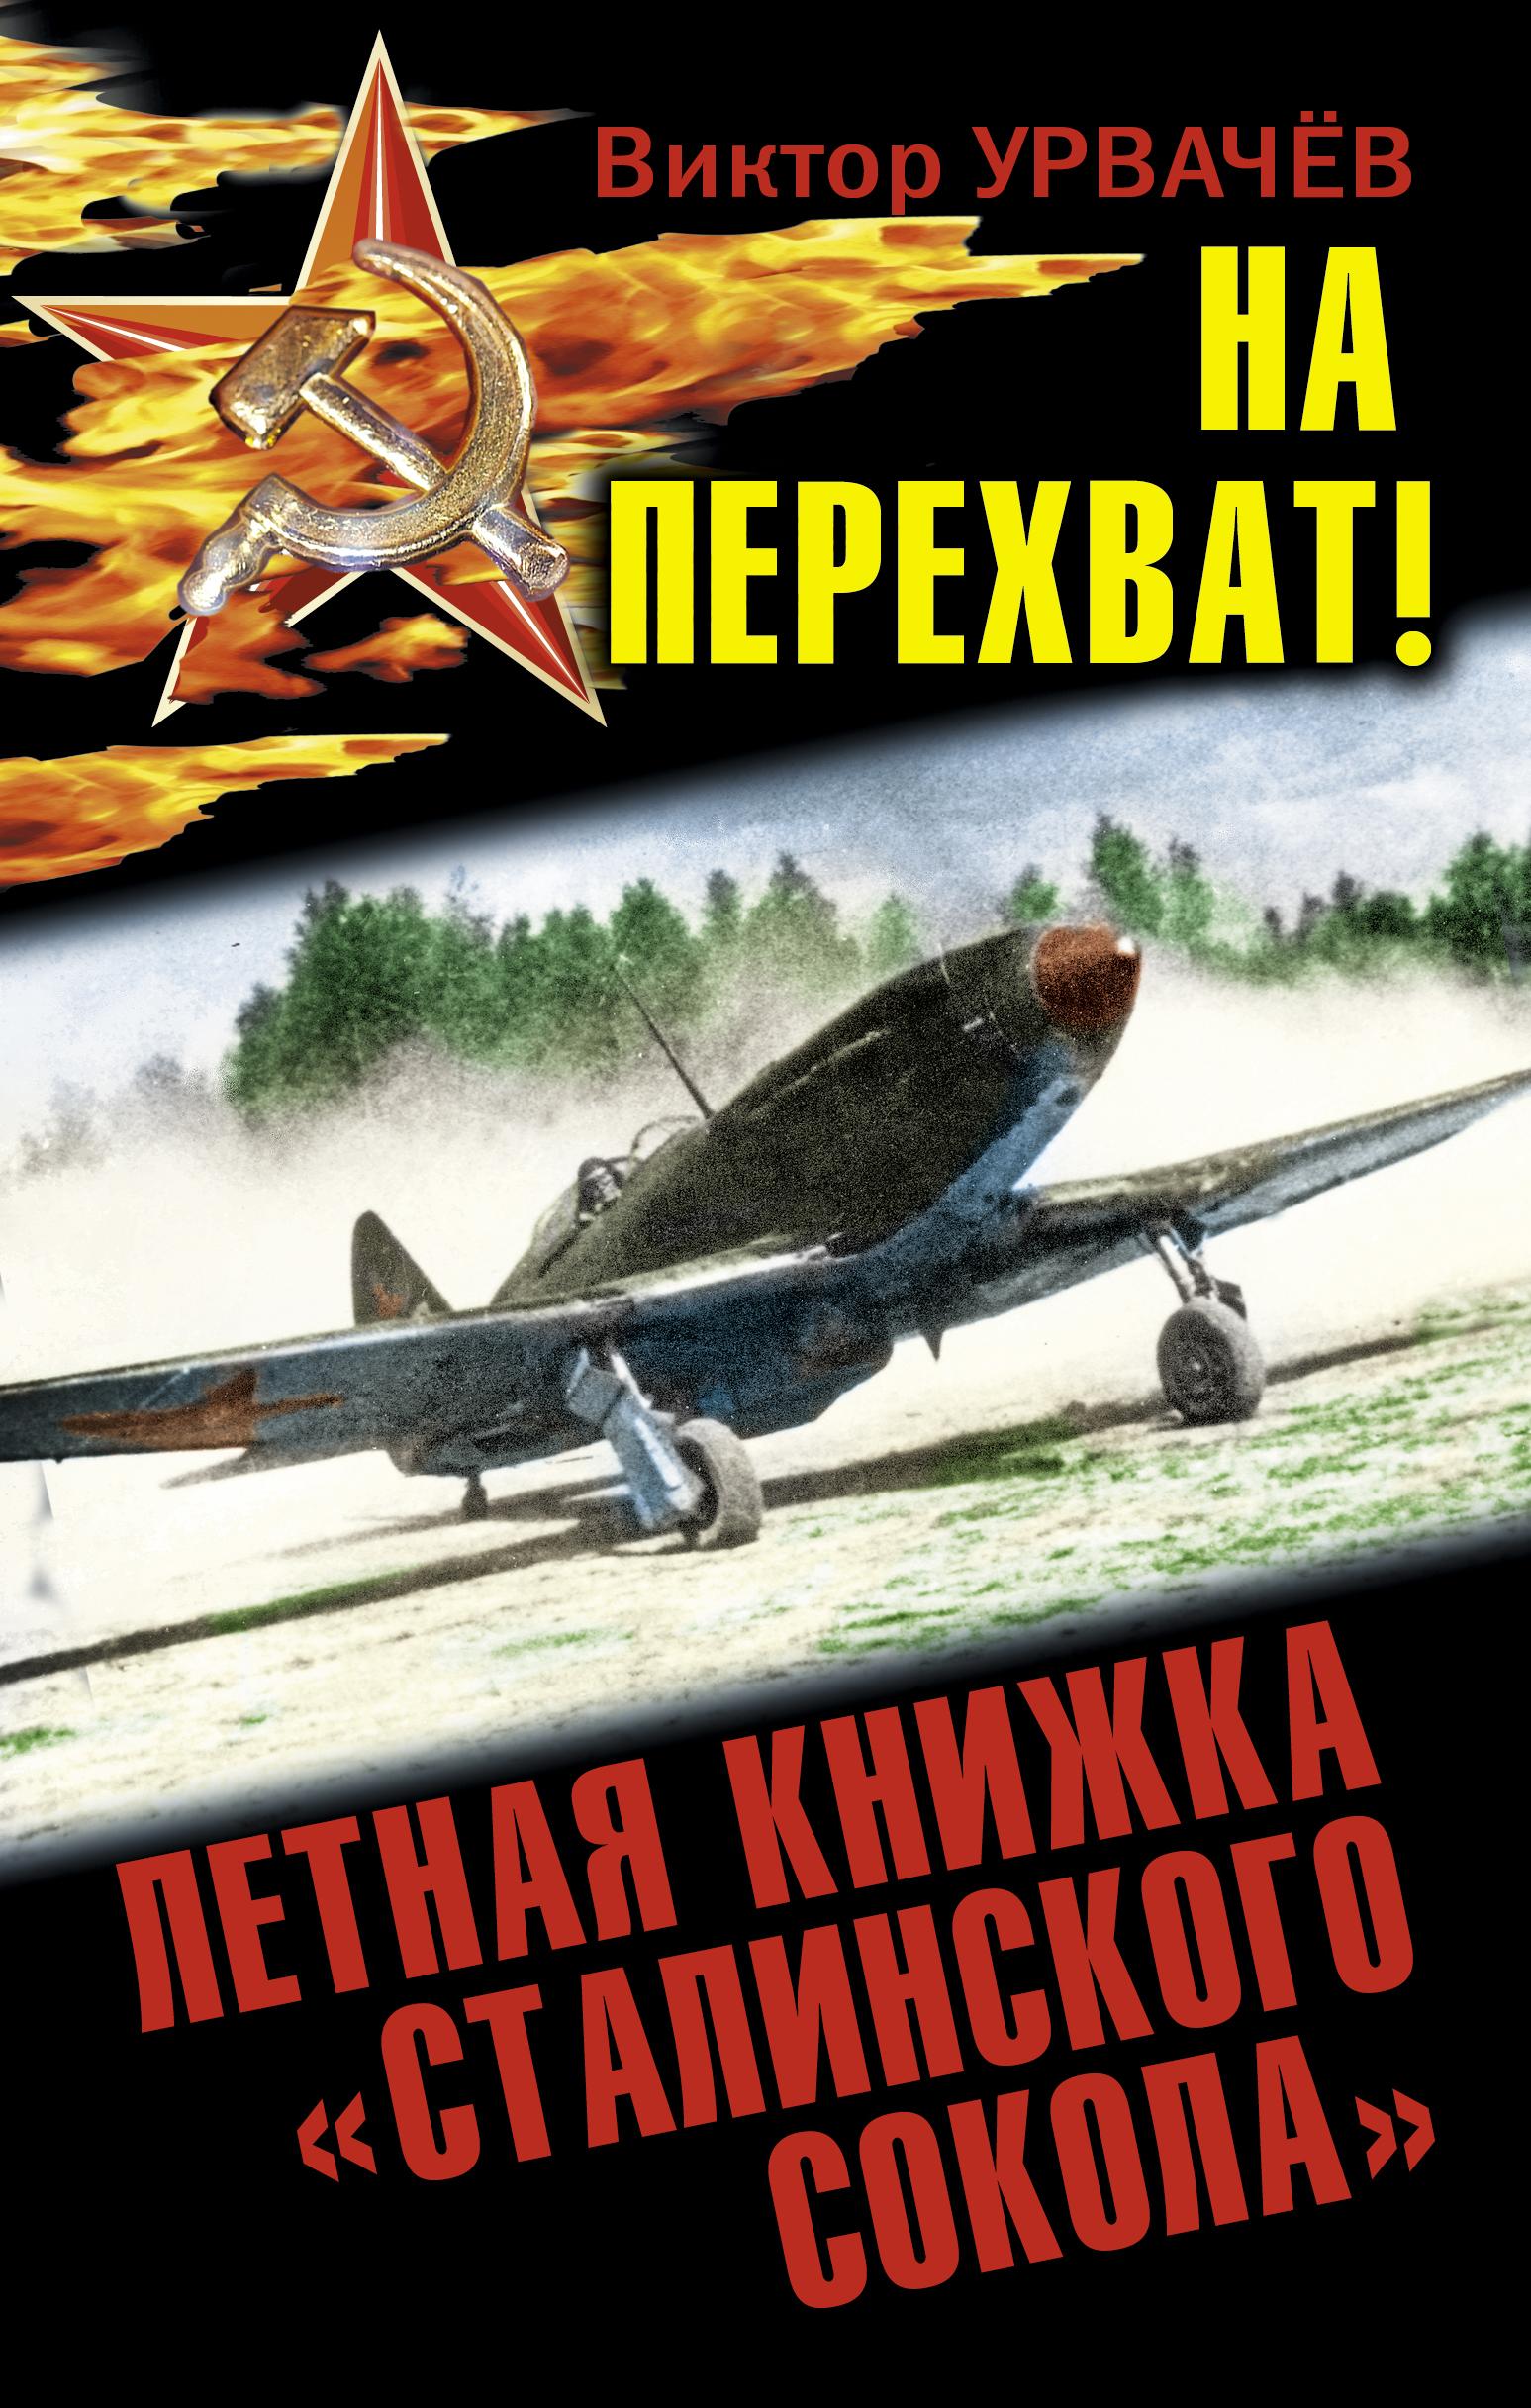 На перехват! Летная книжка «сталинского сокола»